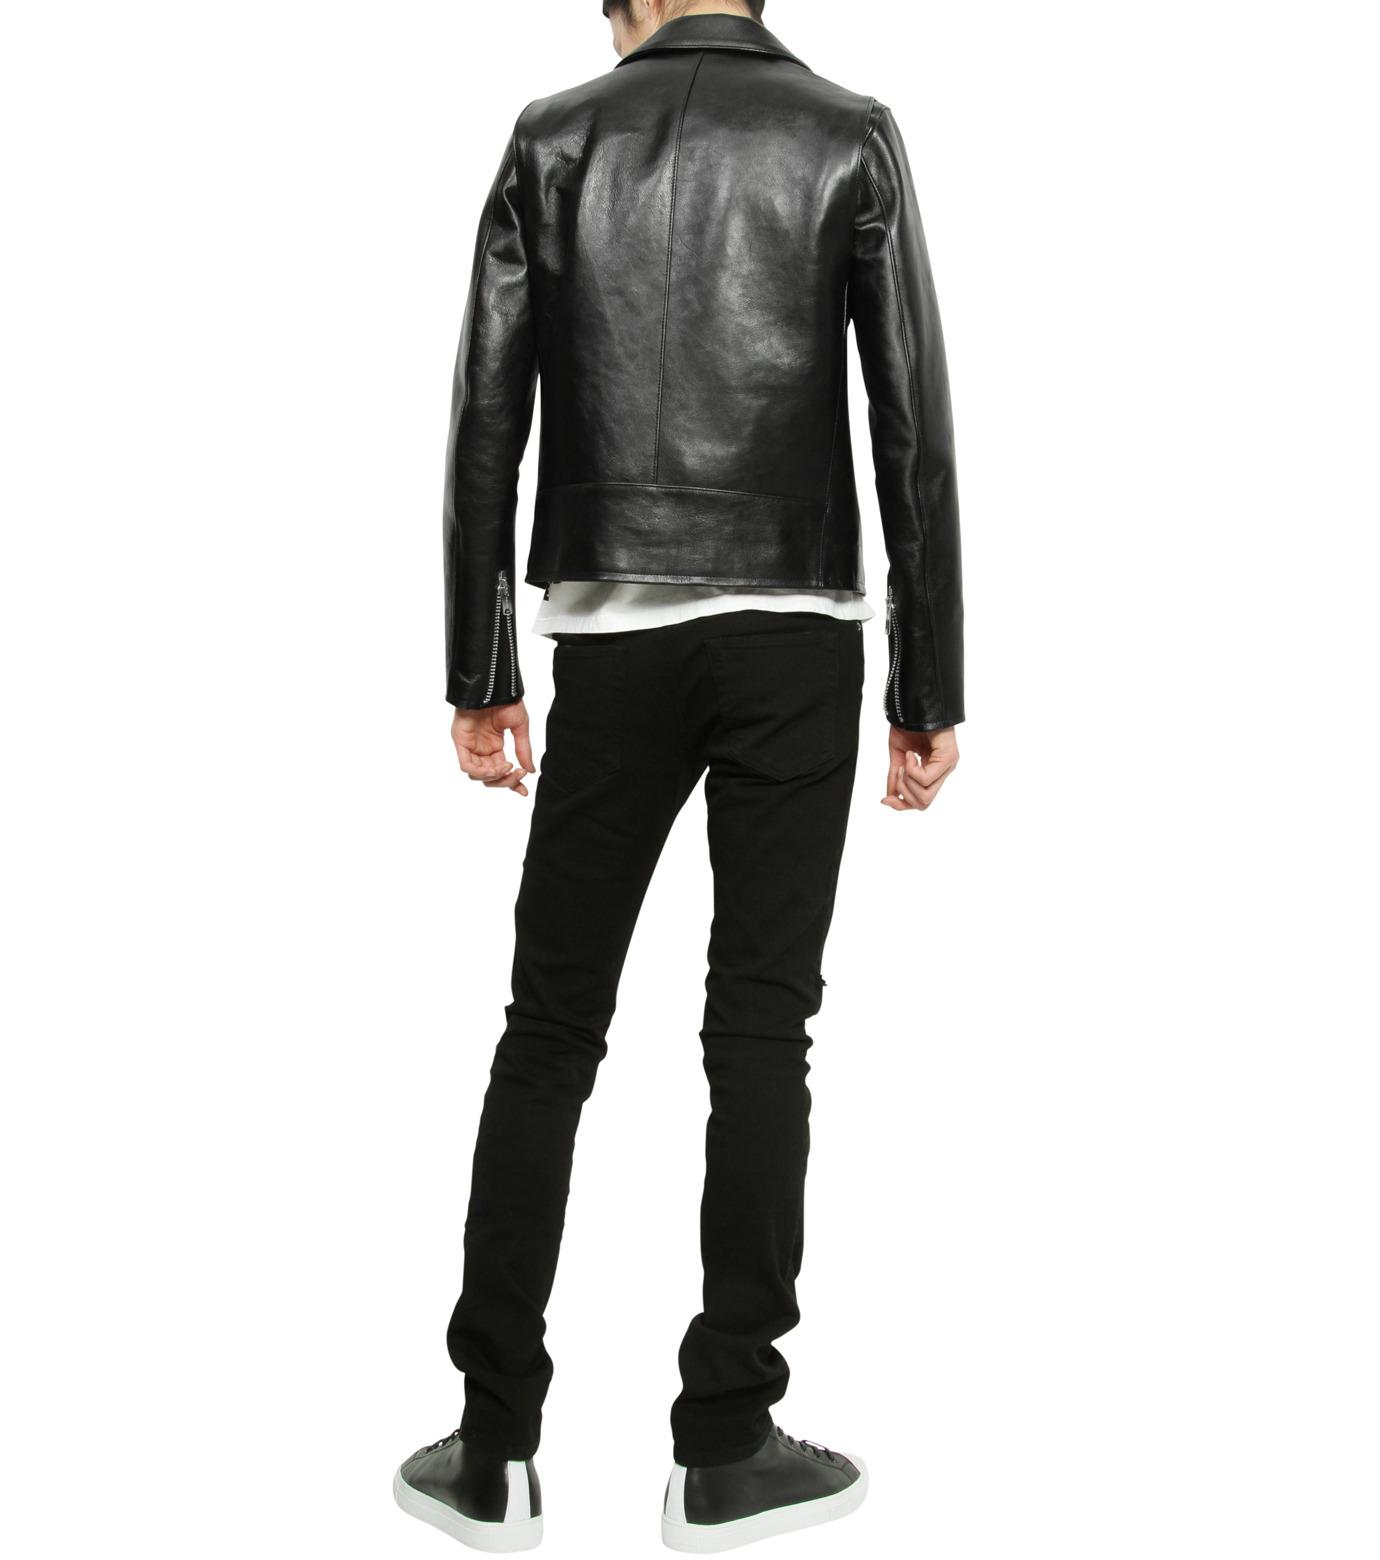 HL HEDDIE LOVU(エイチエル・エディールーヴ)のHL Riders S JK-BLACK(ジャケット/jacket)-17S94002-13 拡大詳細画像6